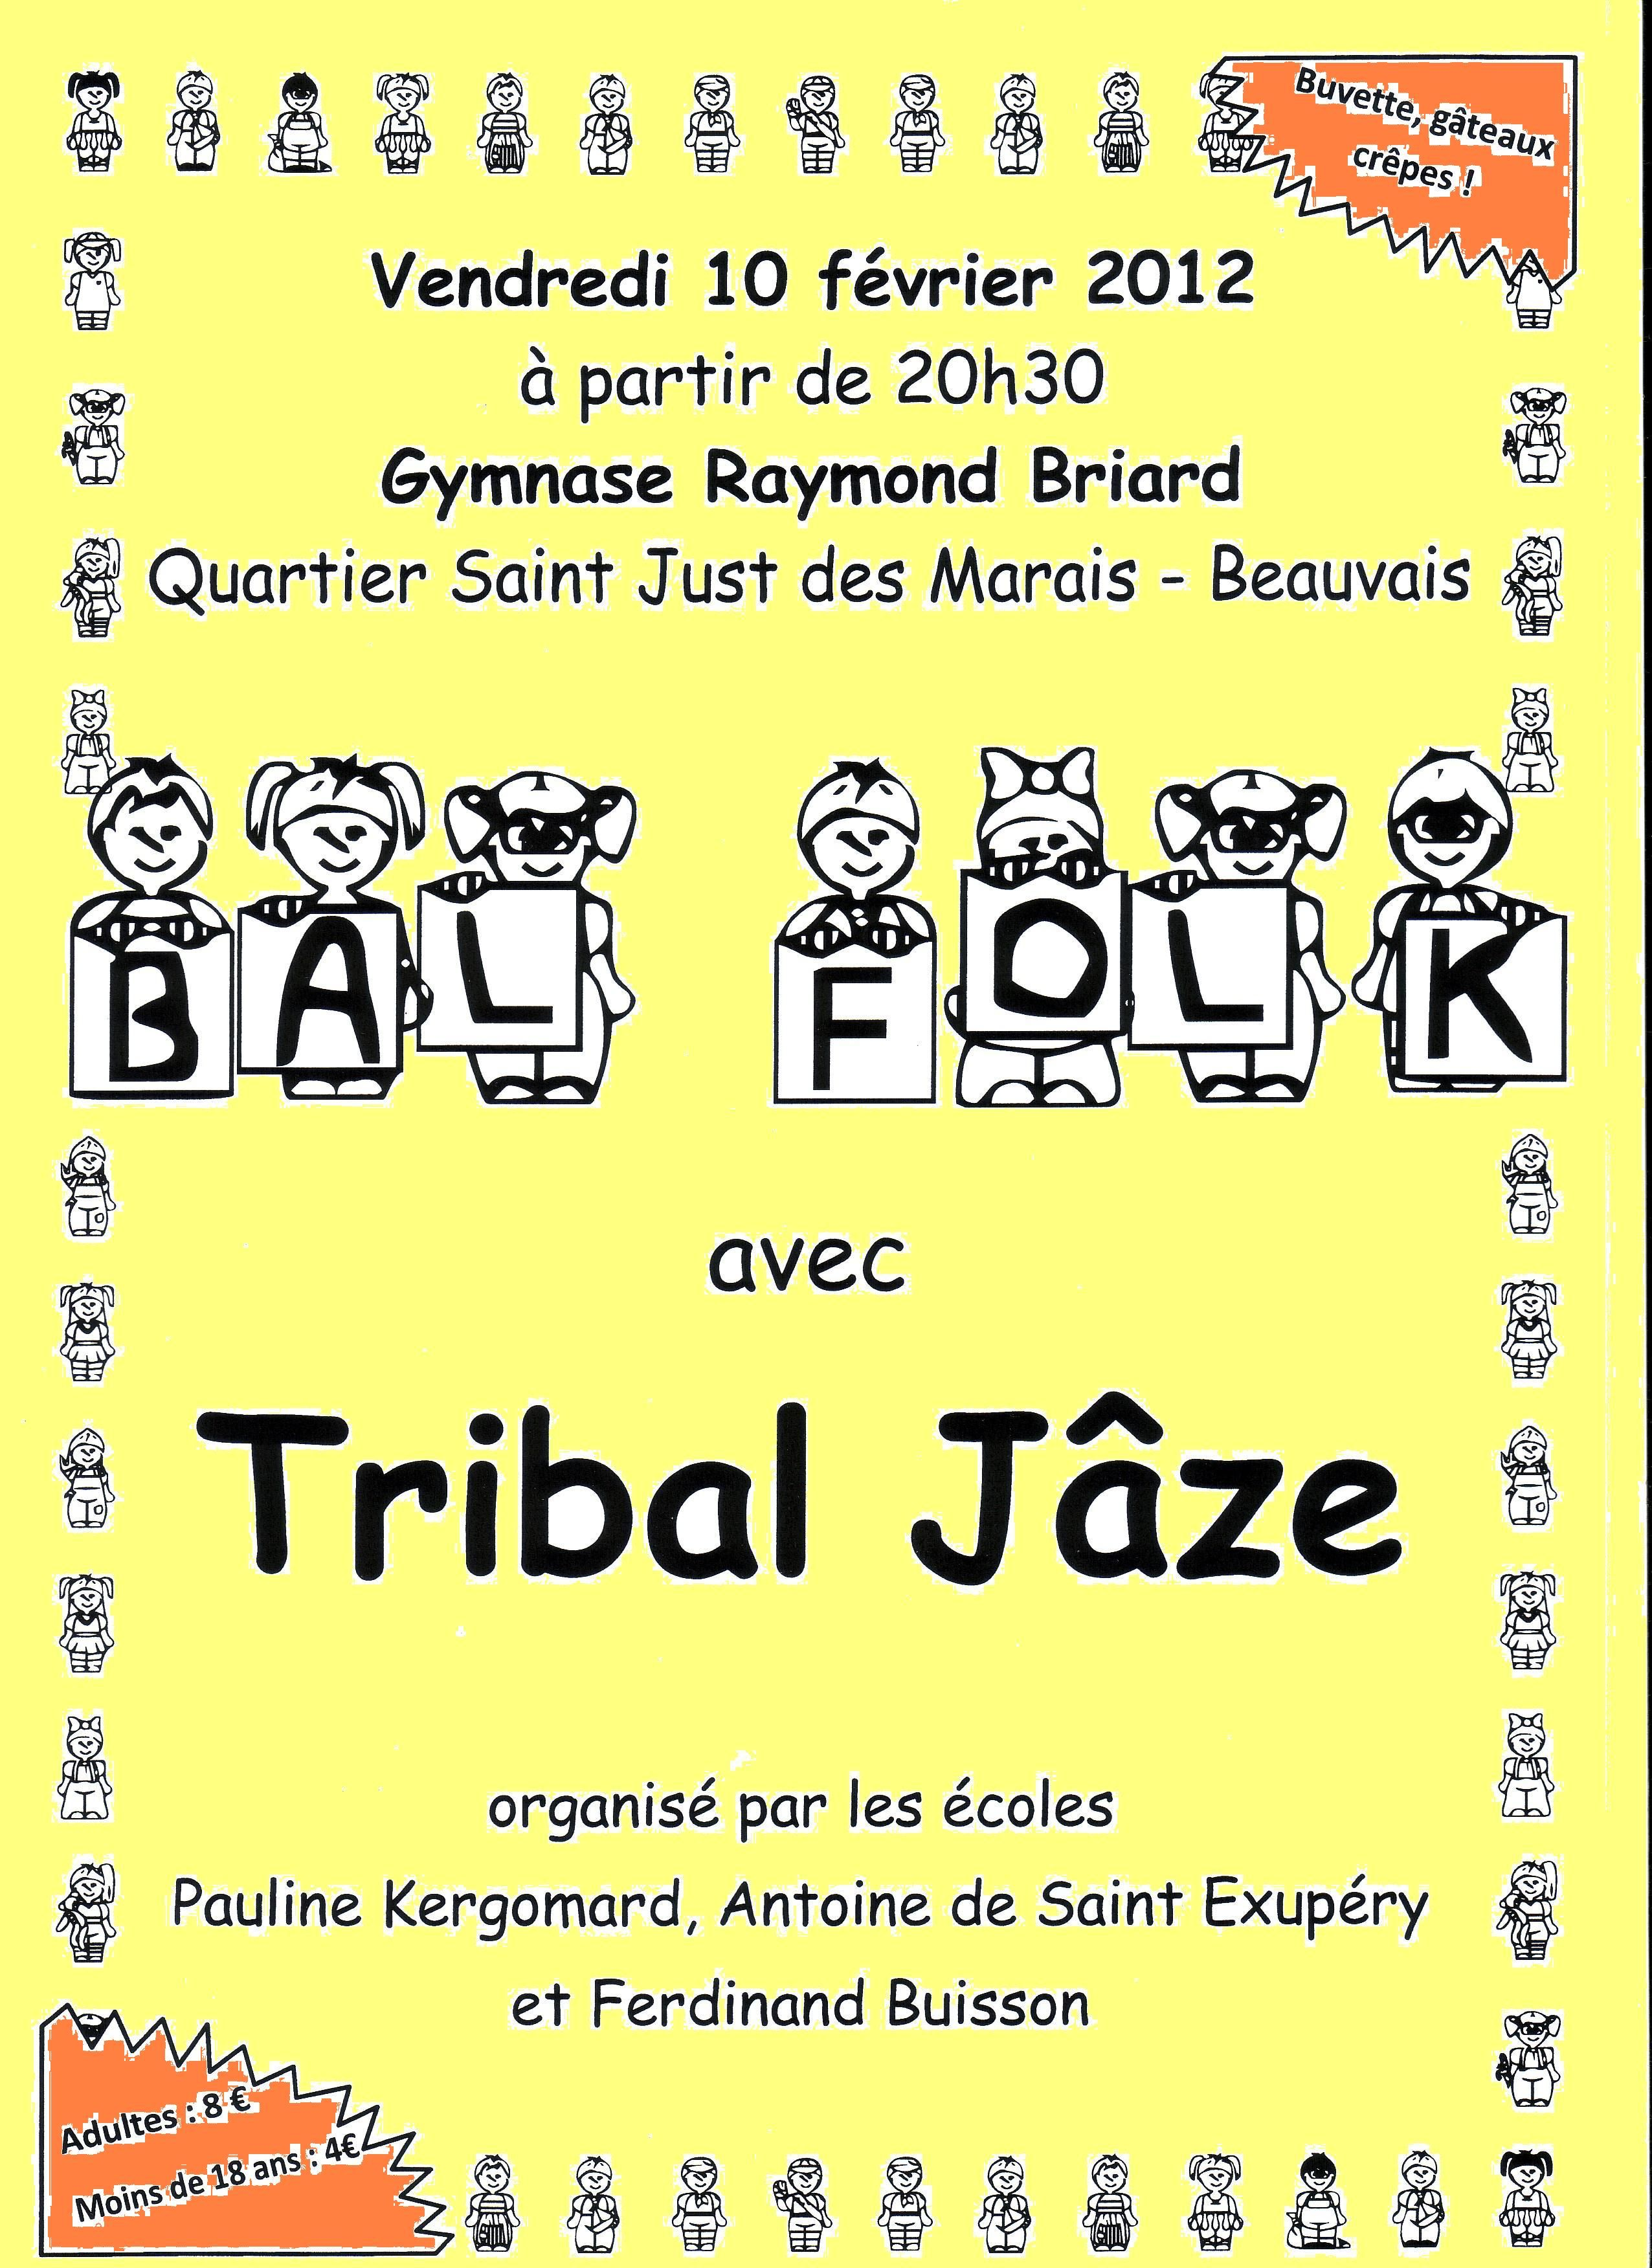 Bal folk avec Tribal Jâze vendredi 10 février à 20h30 au gymnase Raymond Briard à Beauvais (60000).